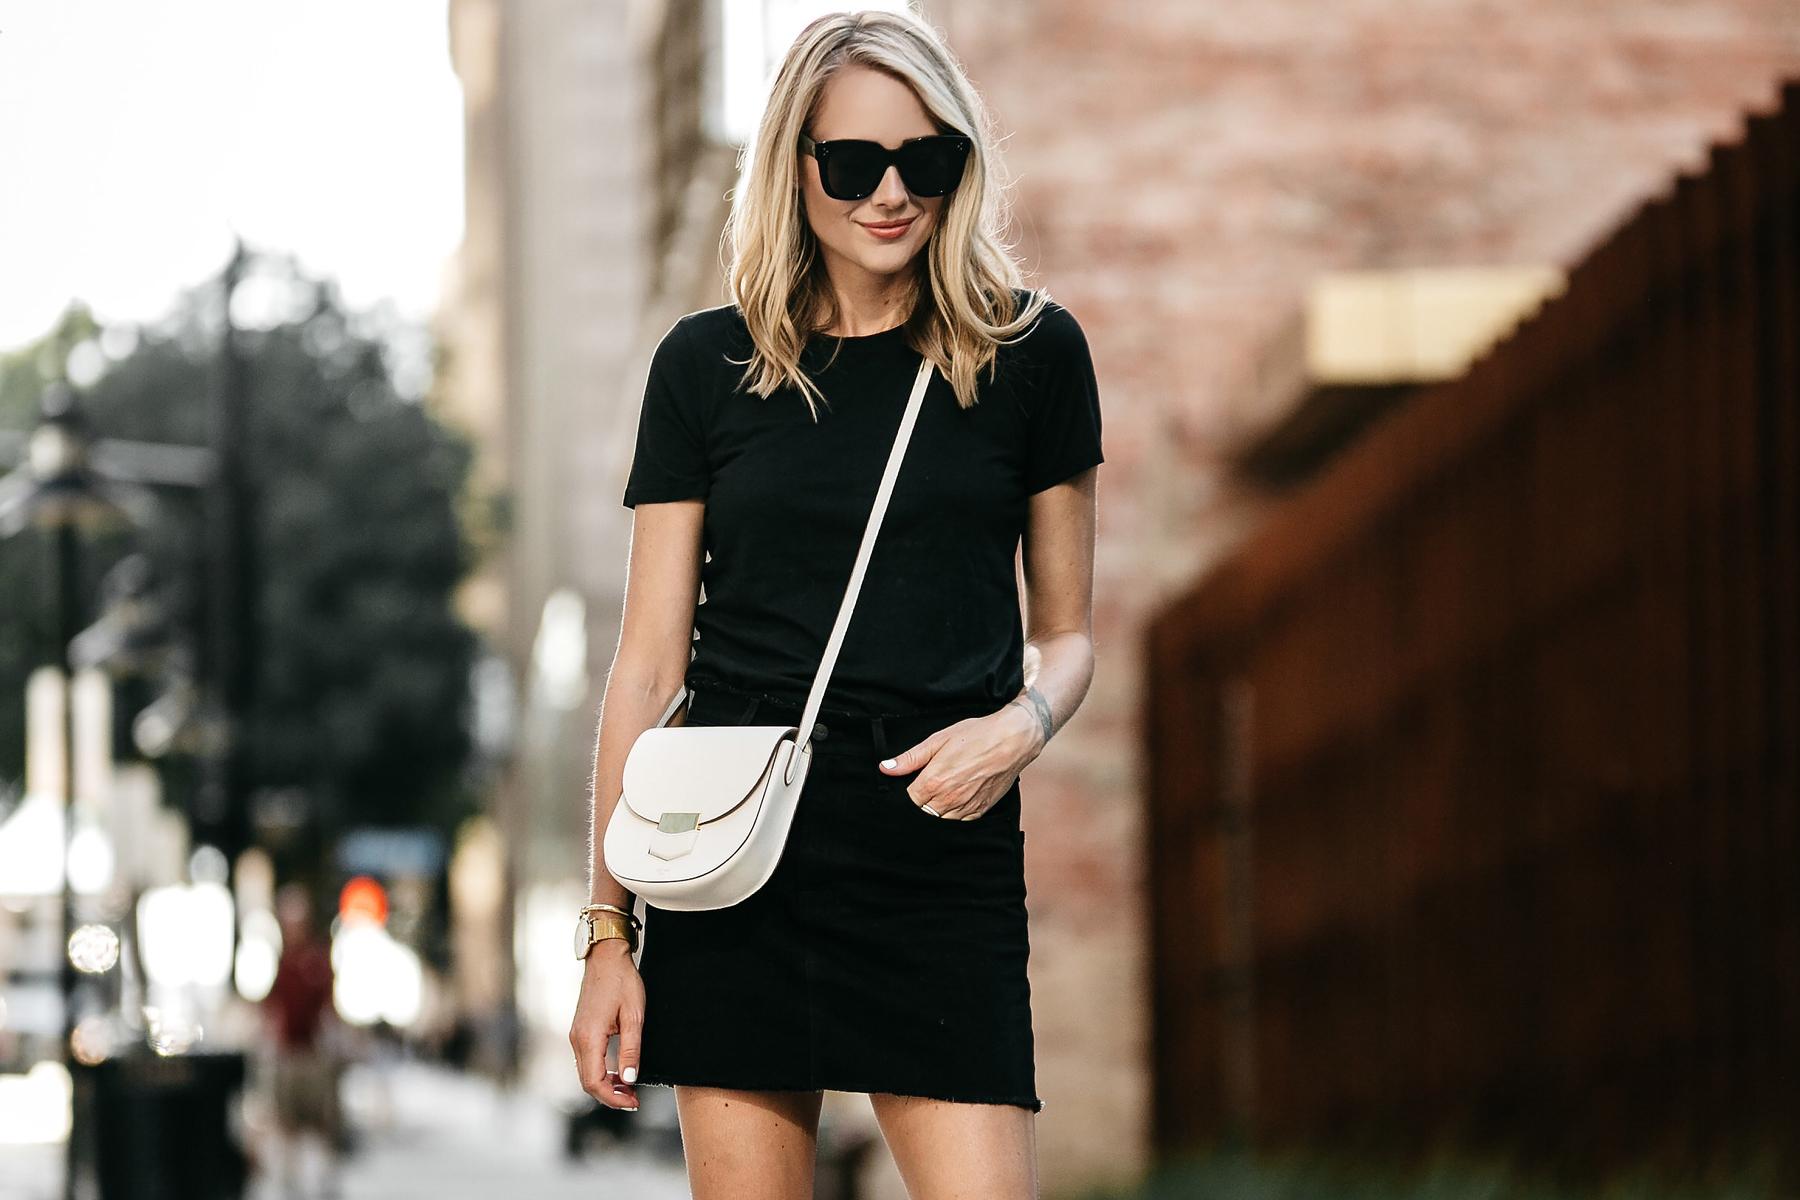 f22a44f45b Blonde Woman Wearing Everlane Black Fitted Tshirt Frame Black Denim Skirt  Outfit Celine White Trotteur Handbag